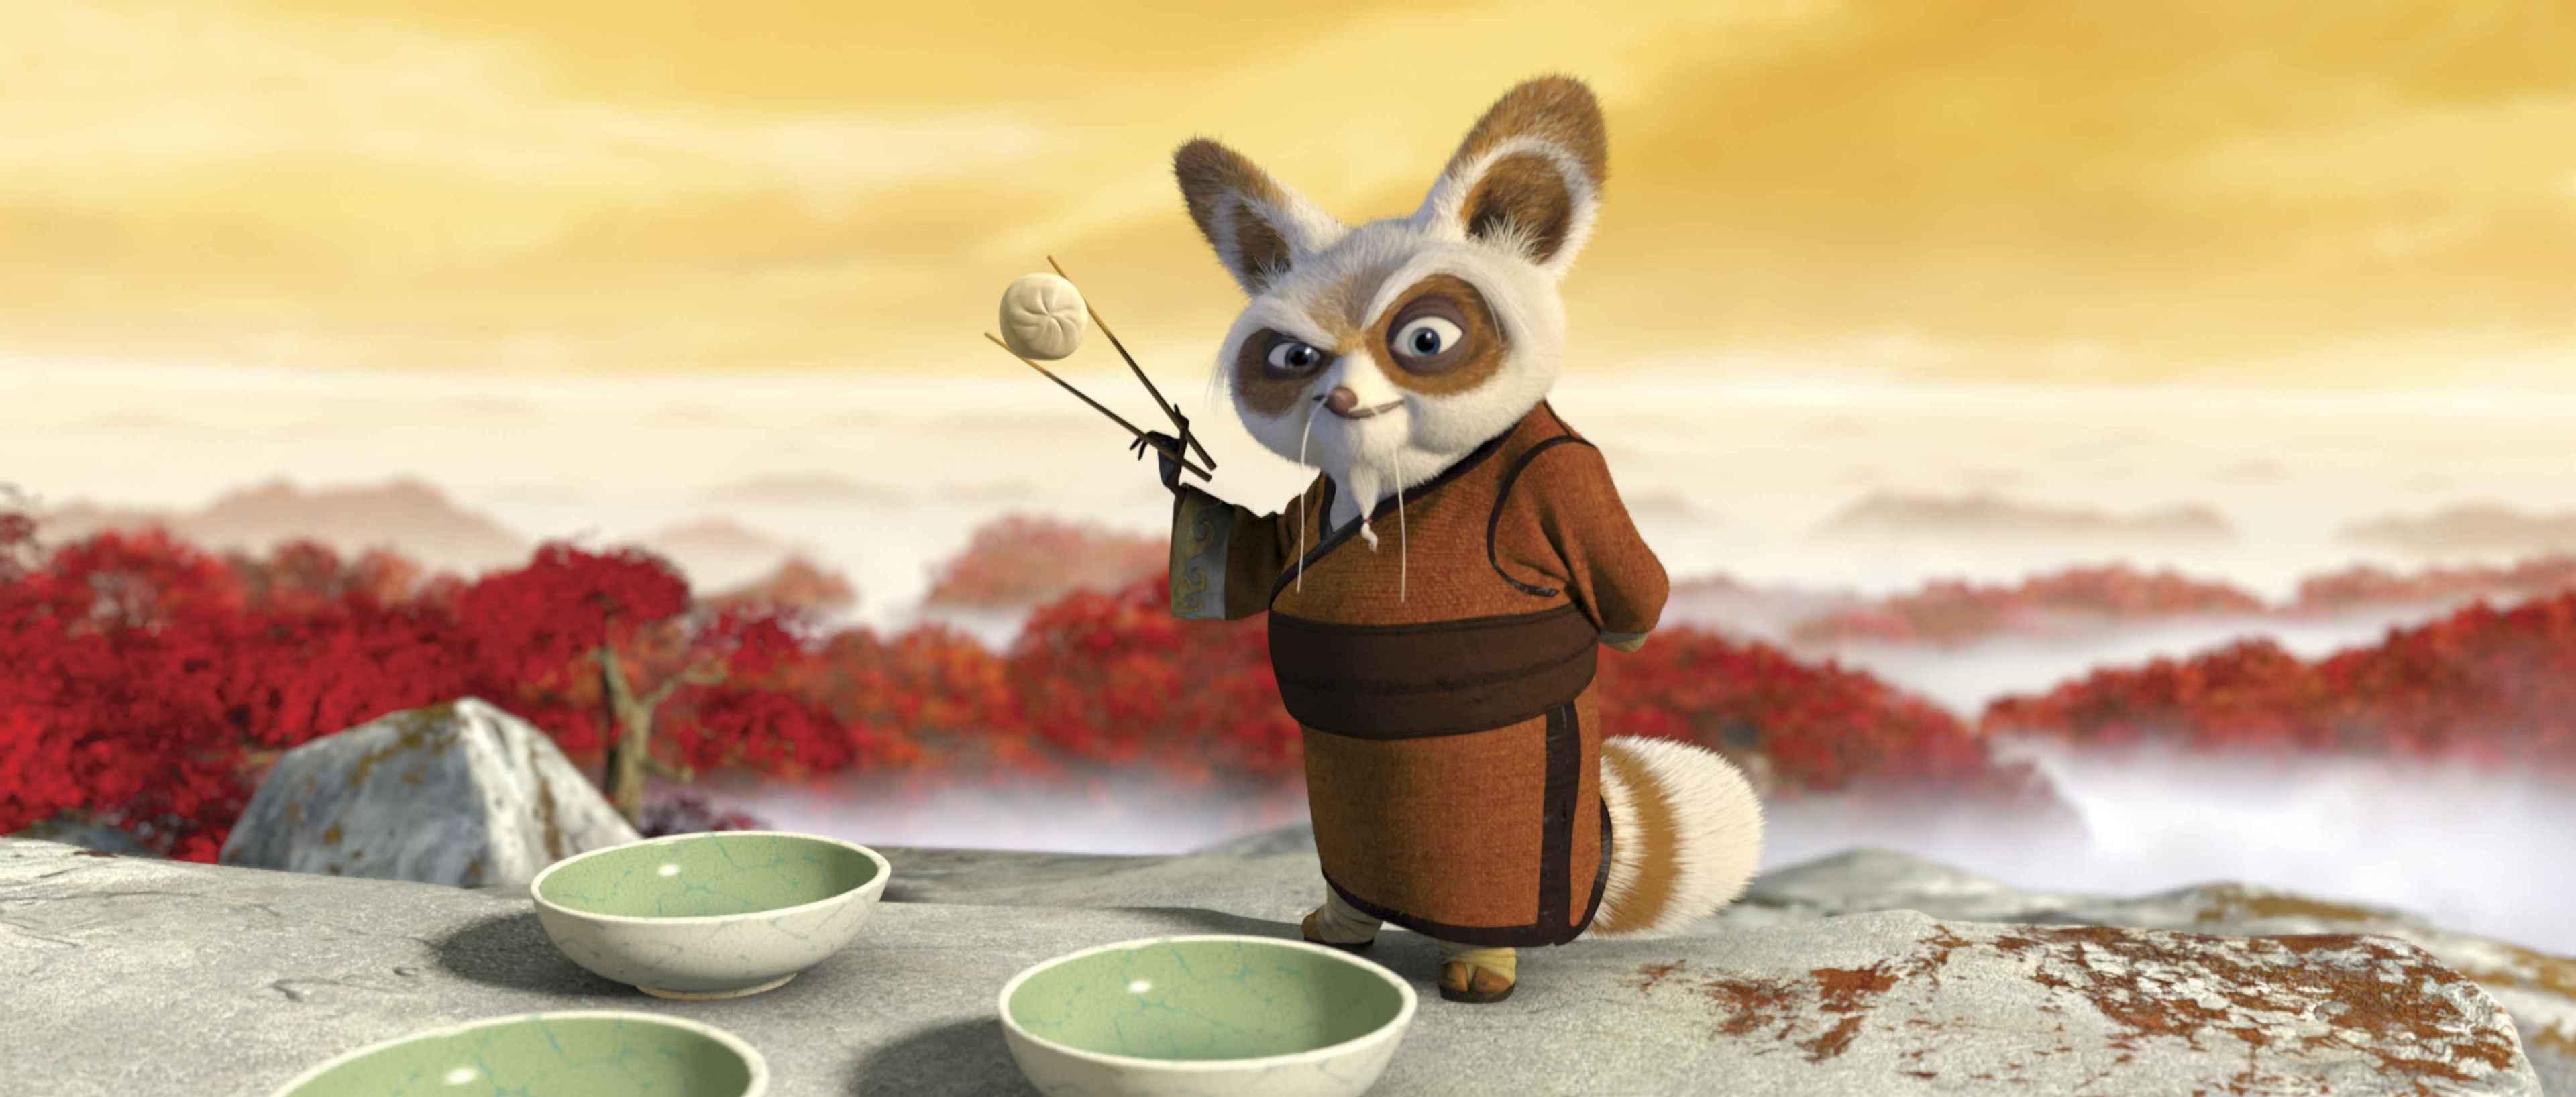 Image Kungfupanda4 Jpg Kung Fu Panda Wiki Fandom Powered By Wikia